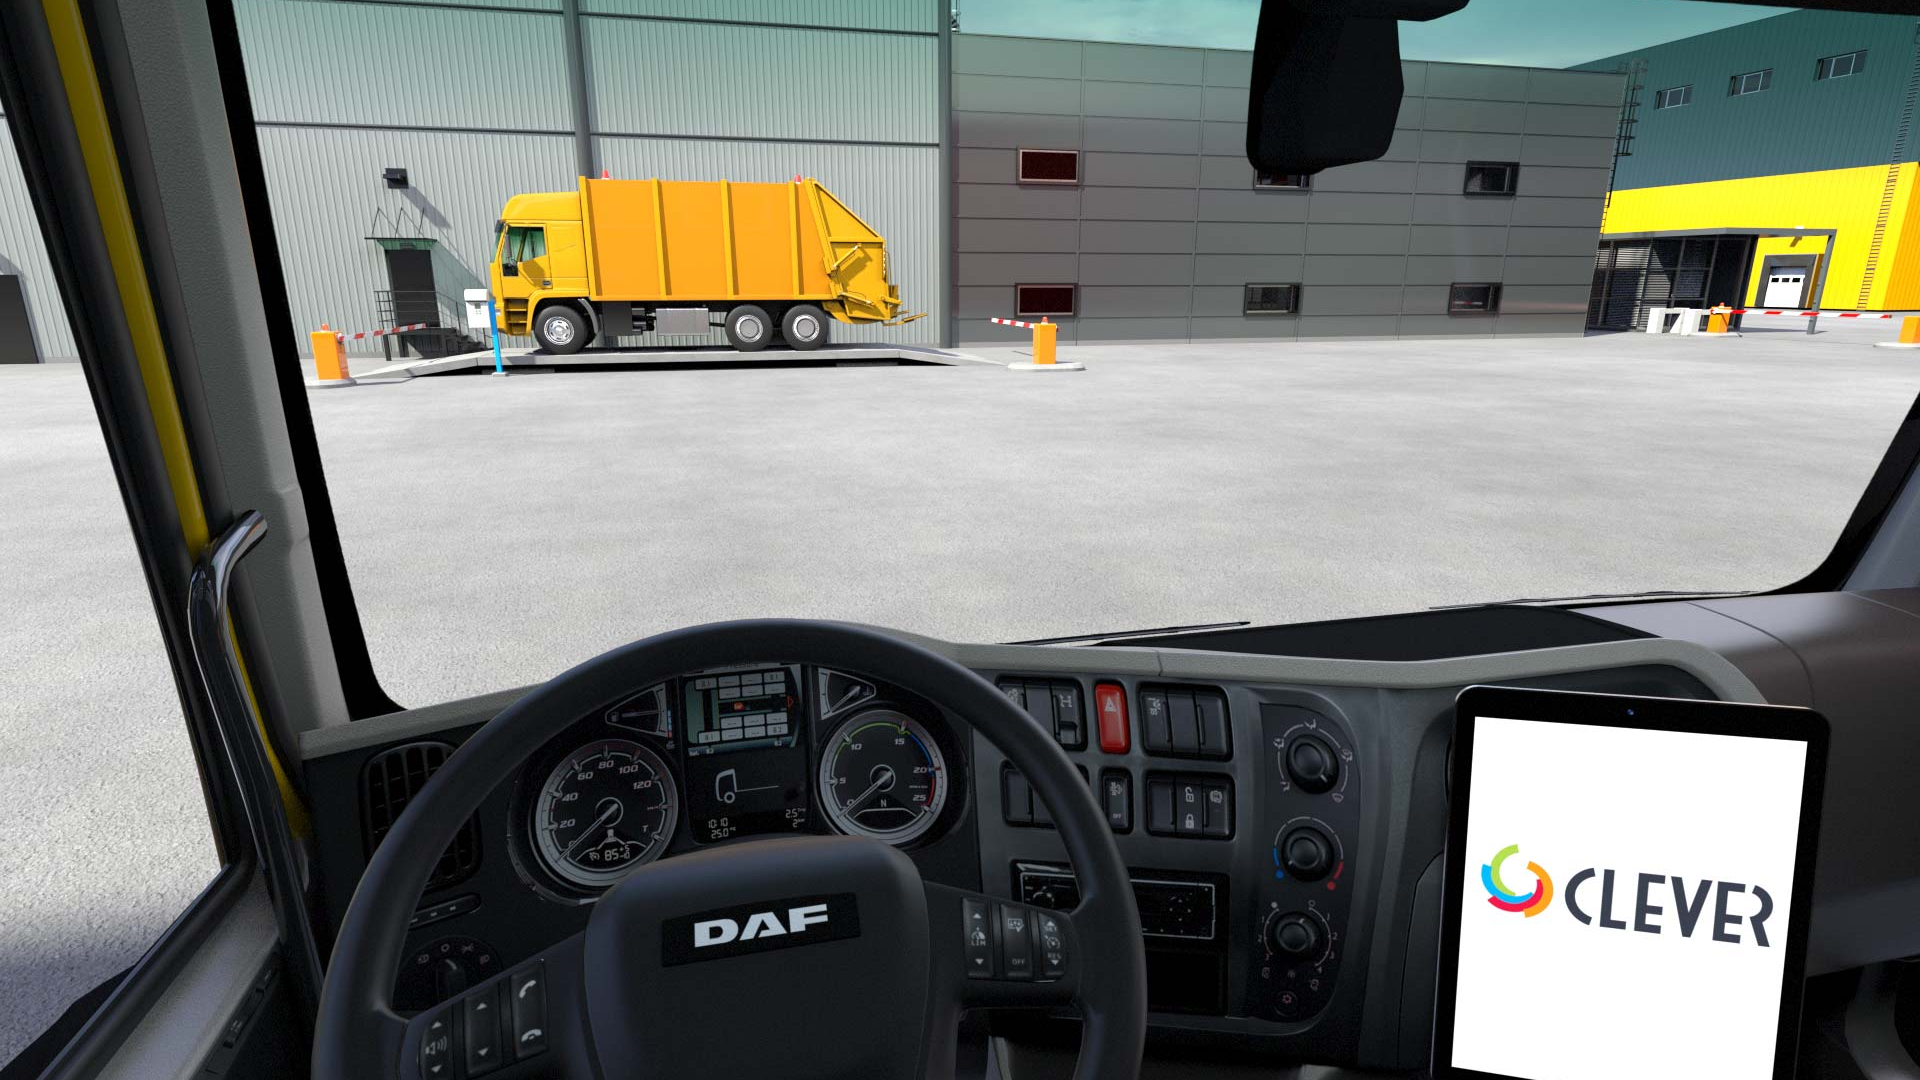 Clever-VR-simulation-e1559042177304